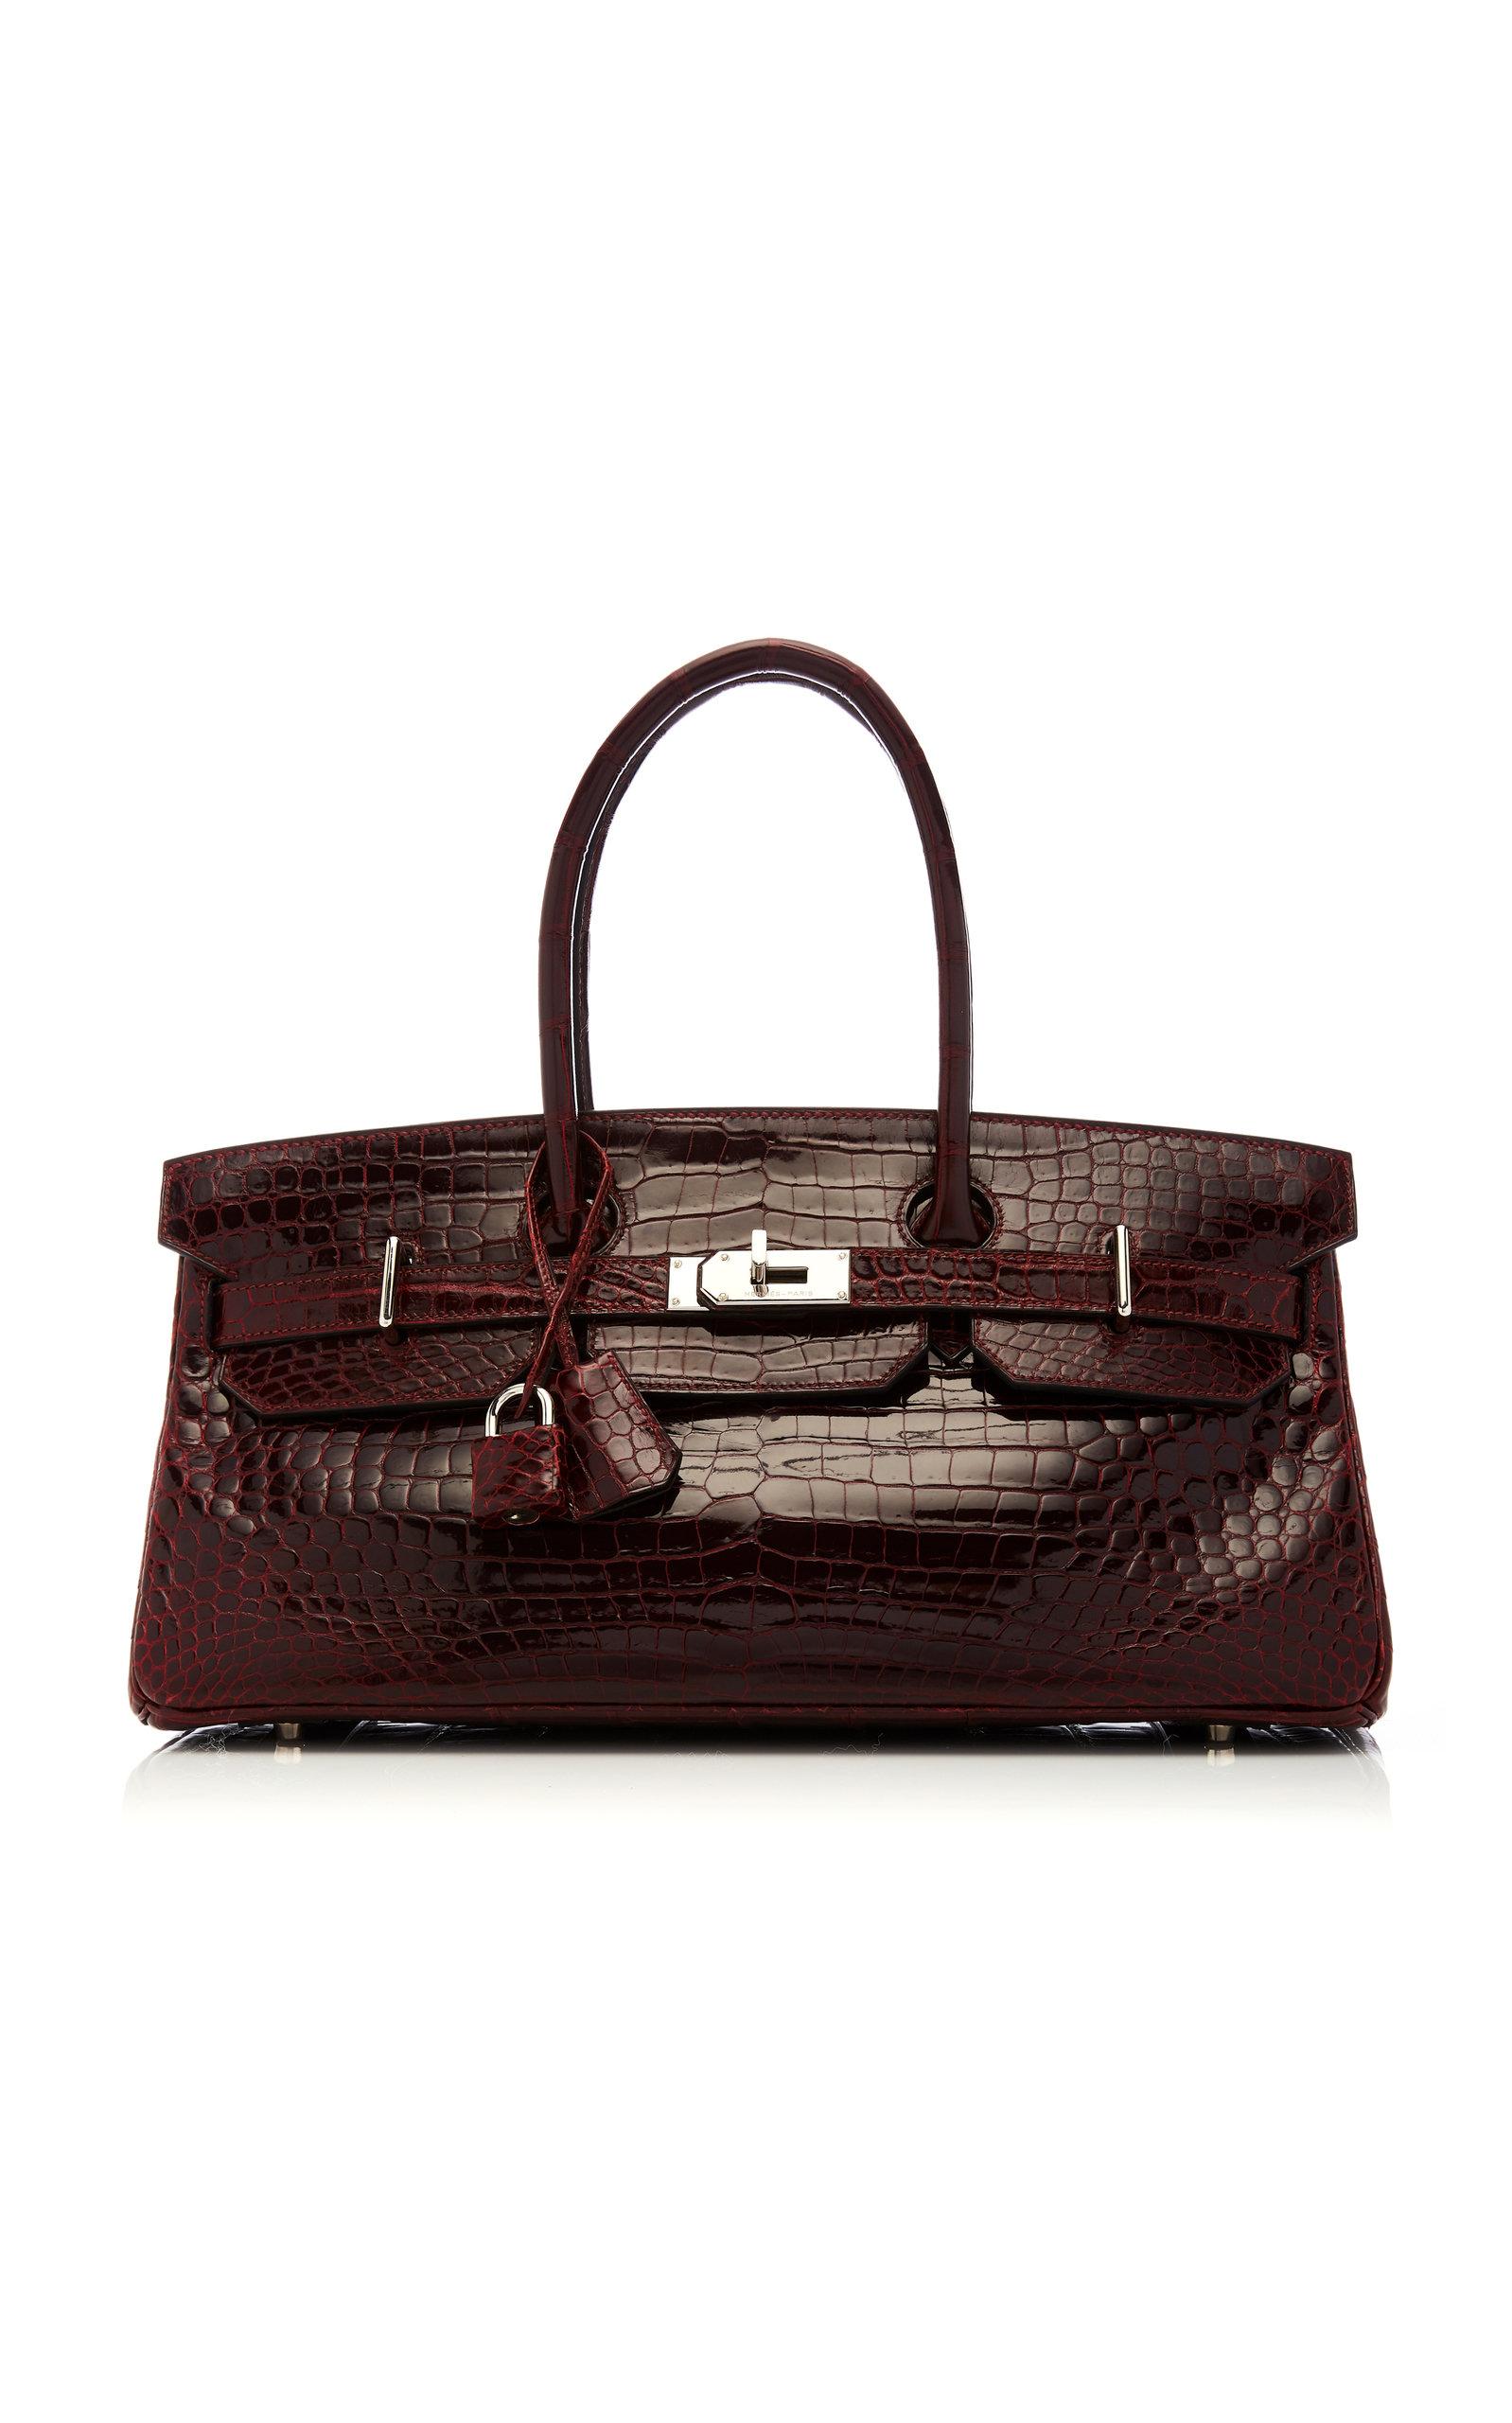 9e46cd53eb Hermès Vintage by Heritage AuctionsHermès 42cm Shiny Bordeaux Porosus  Crocodile JPG Shoulder Birkin